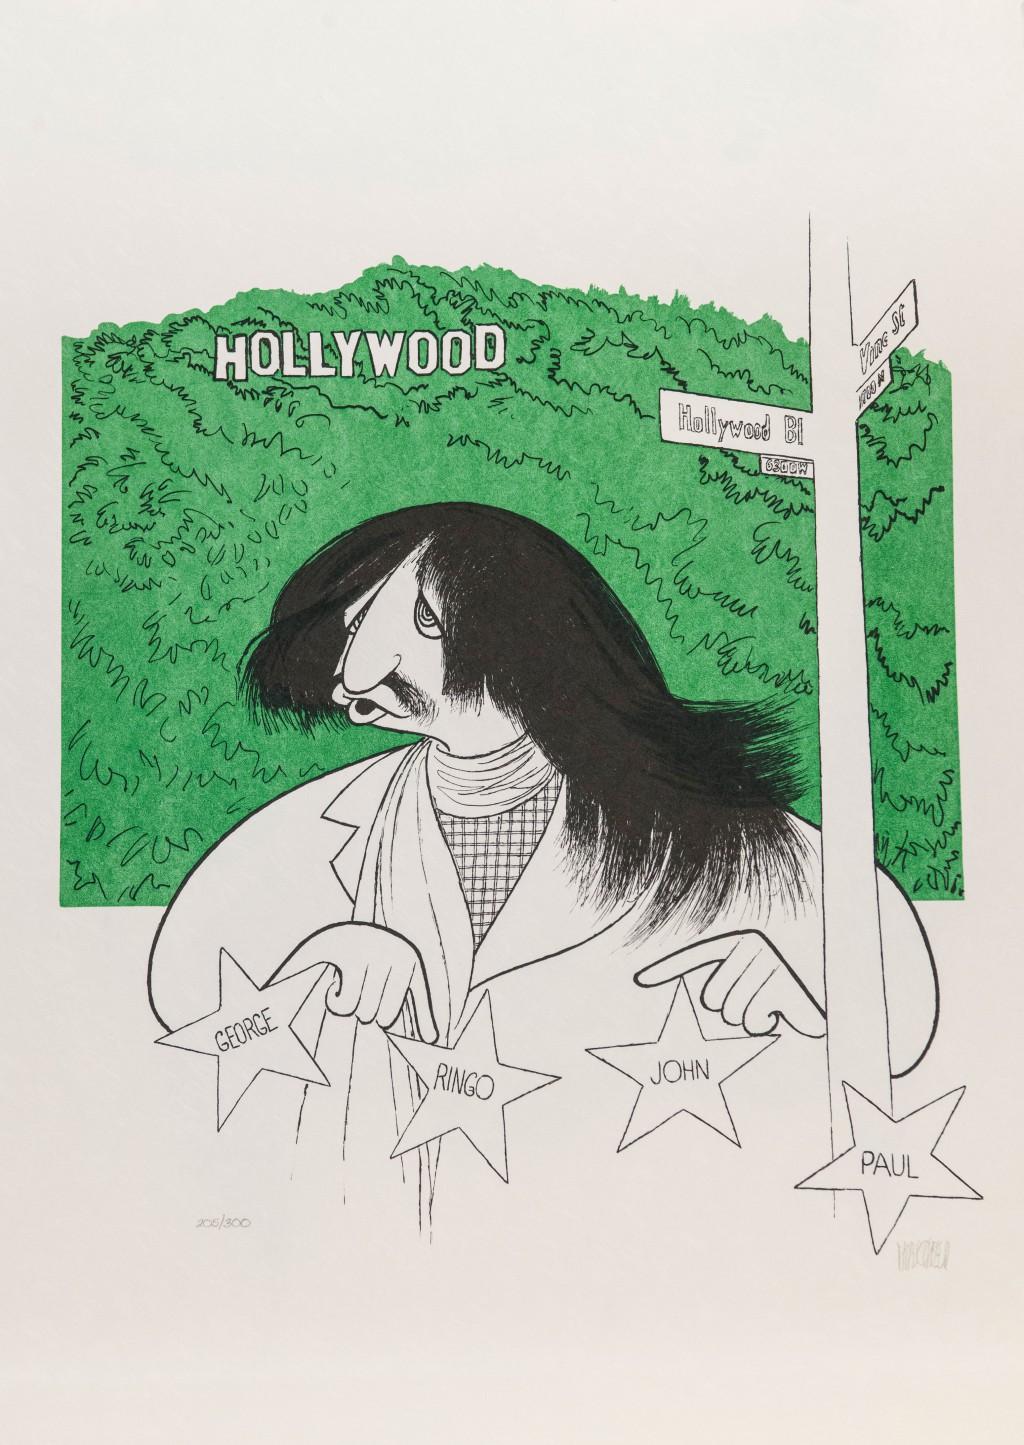 Al Hirschfeld master of line new yorker cartoon celebrity art Ringo Starr Hollywood walk of fame hollywood sign